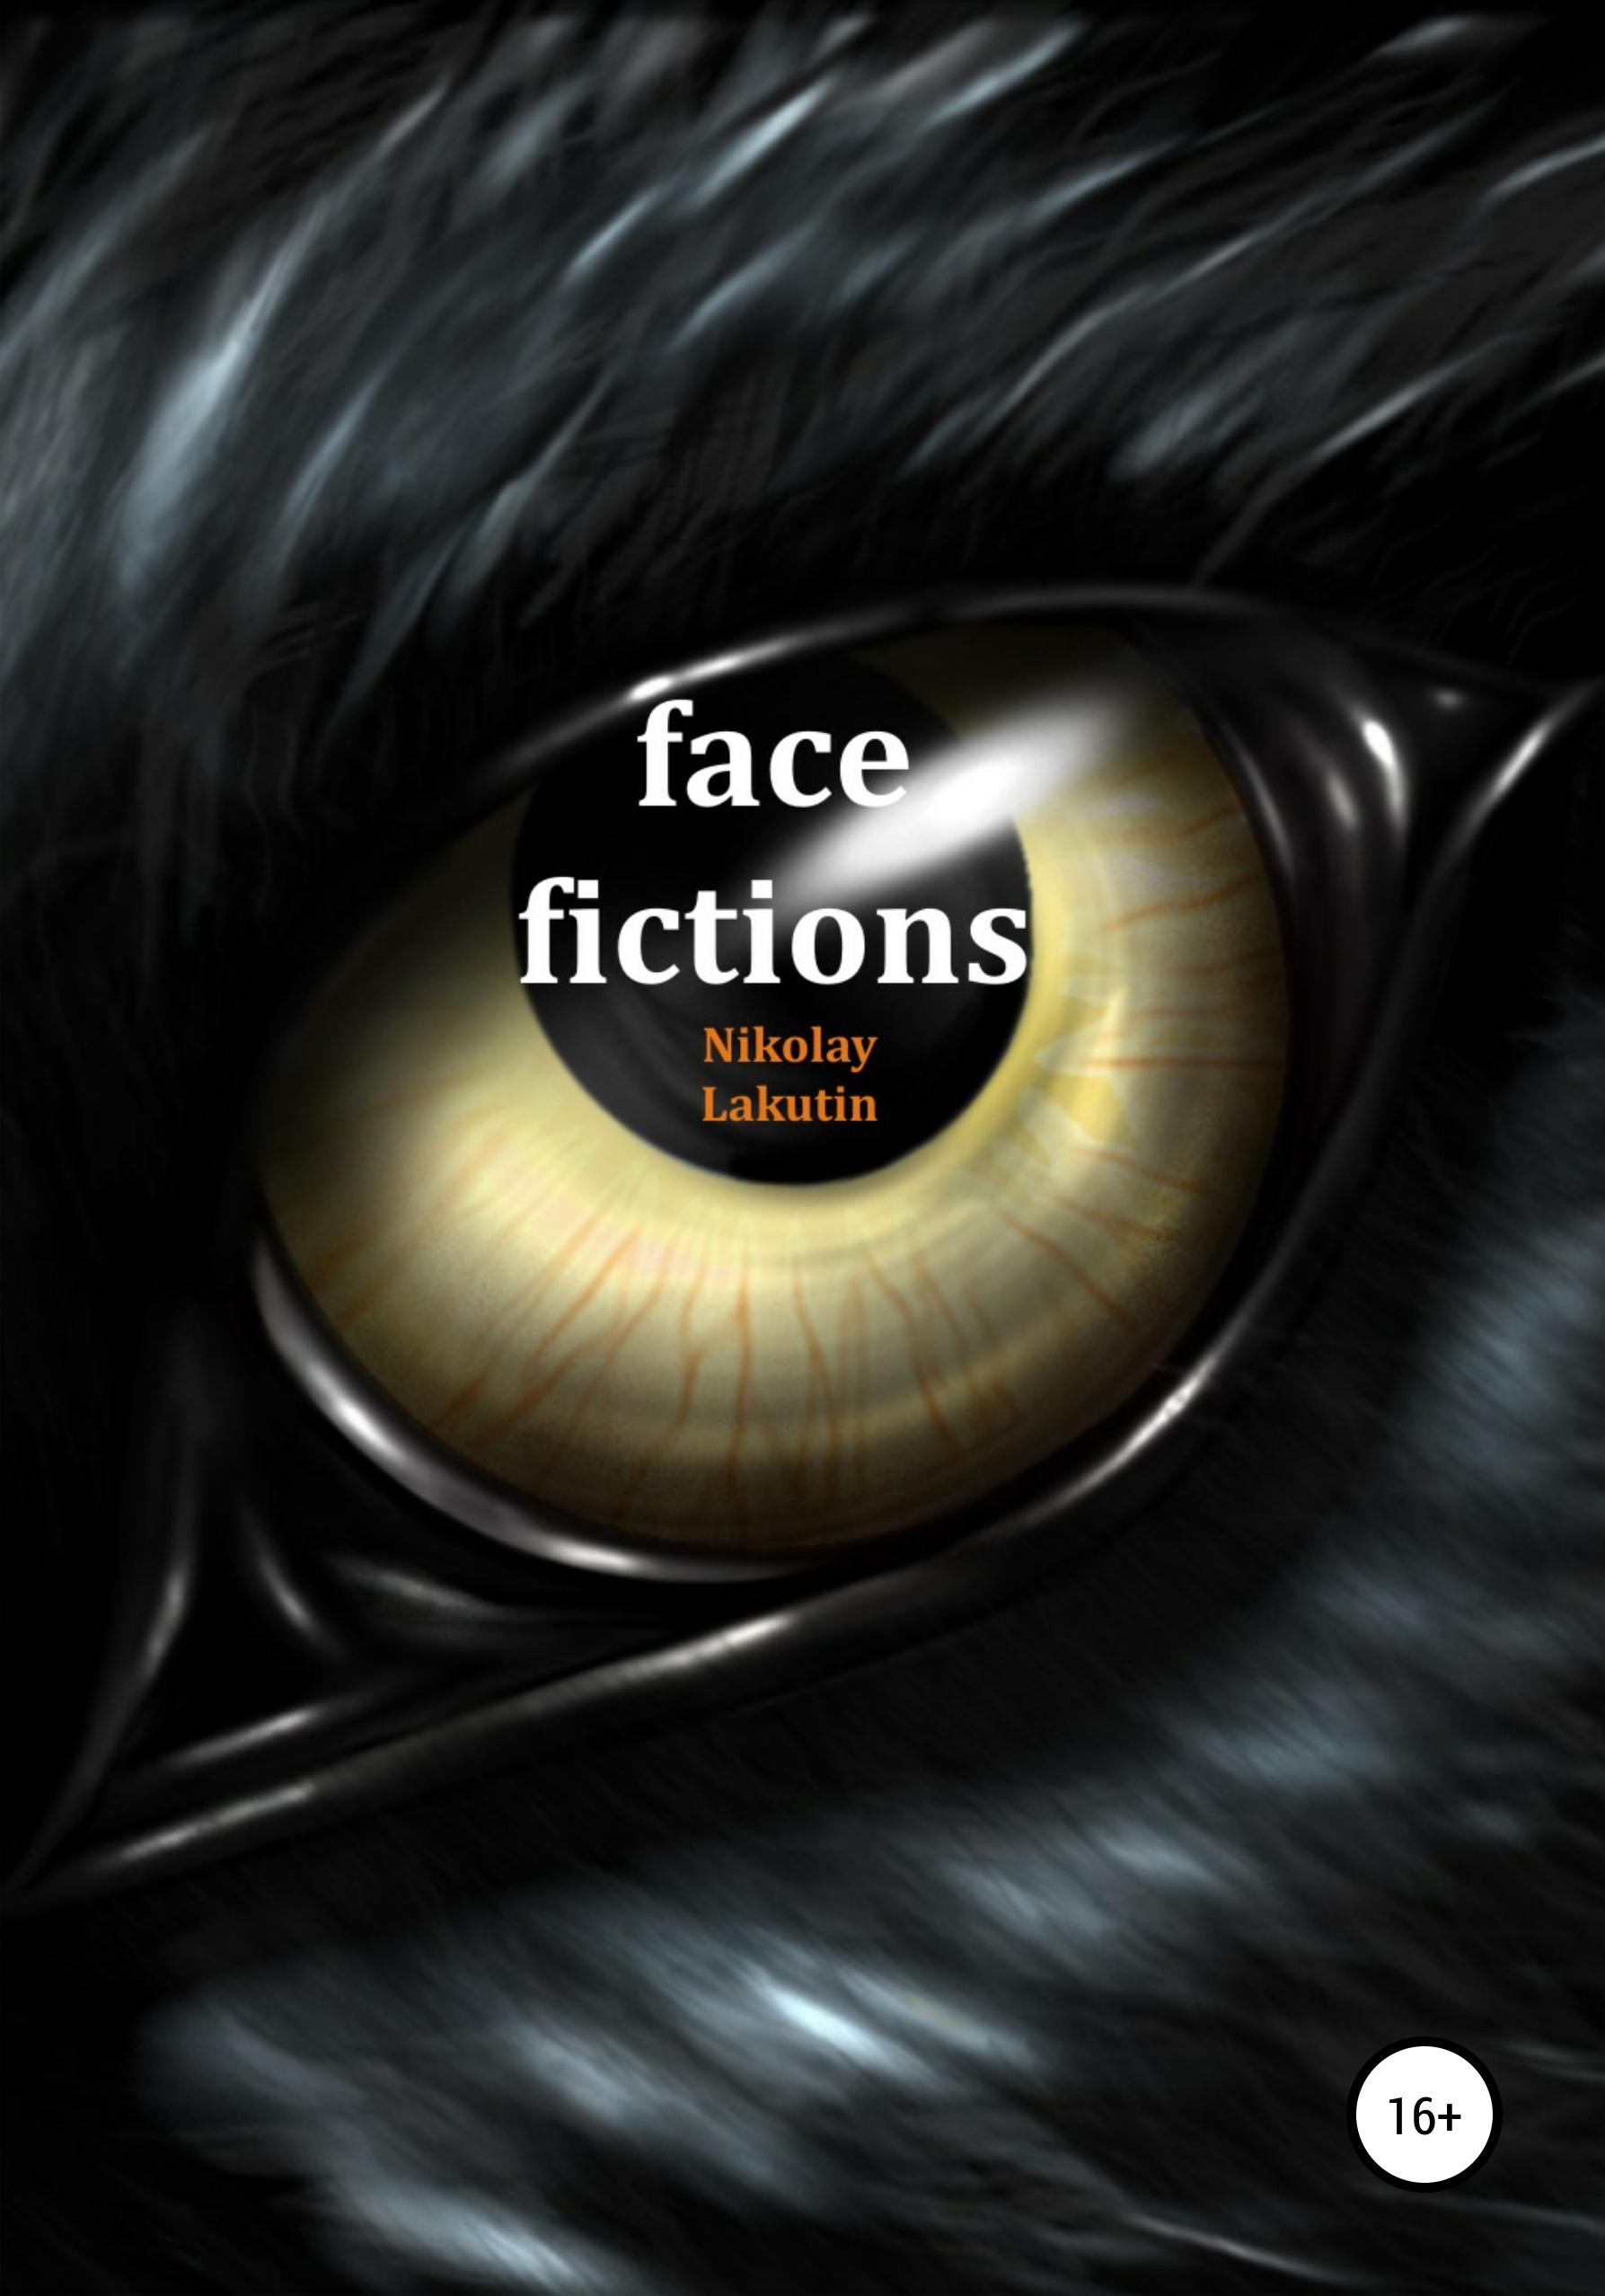 цена на Nikolay Lakutin Face fictions